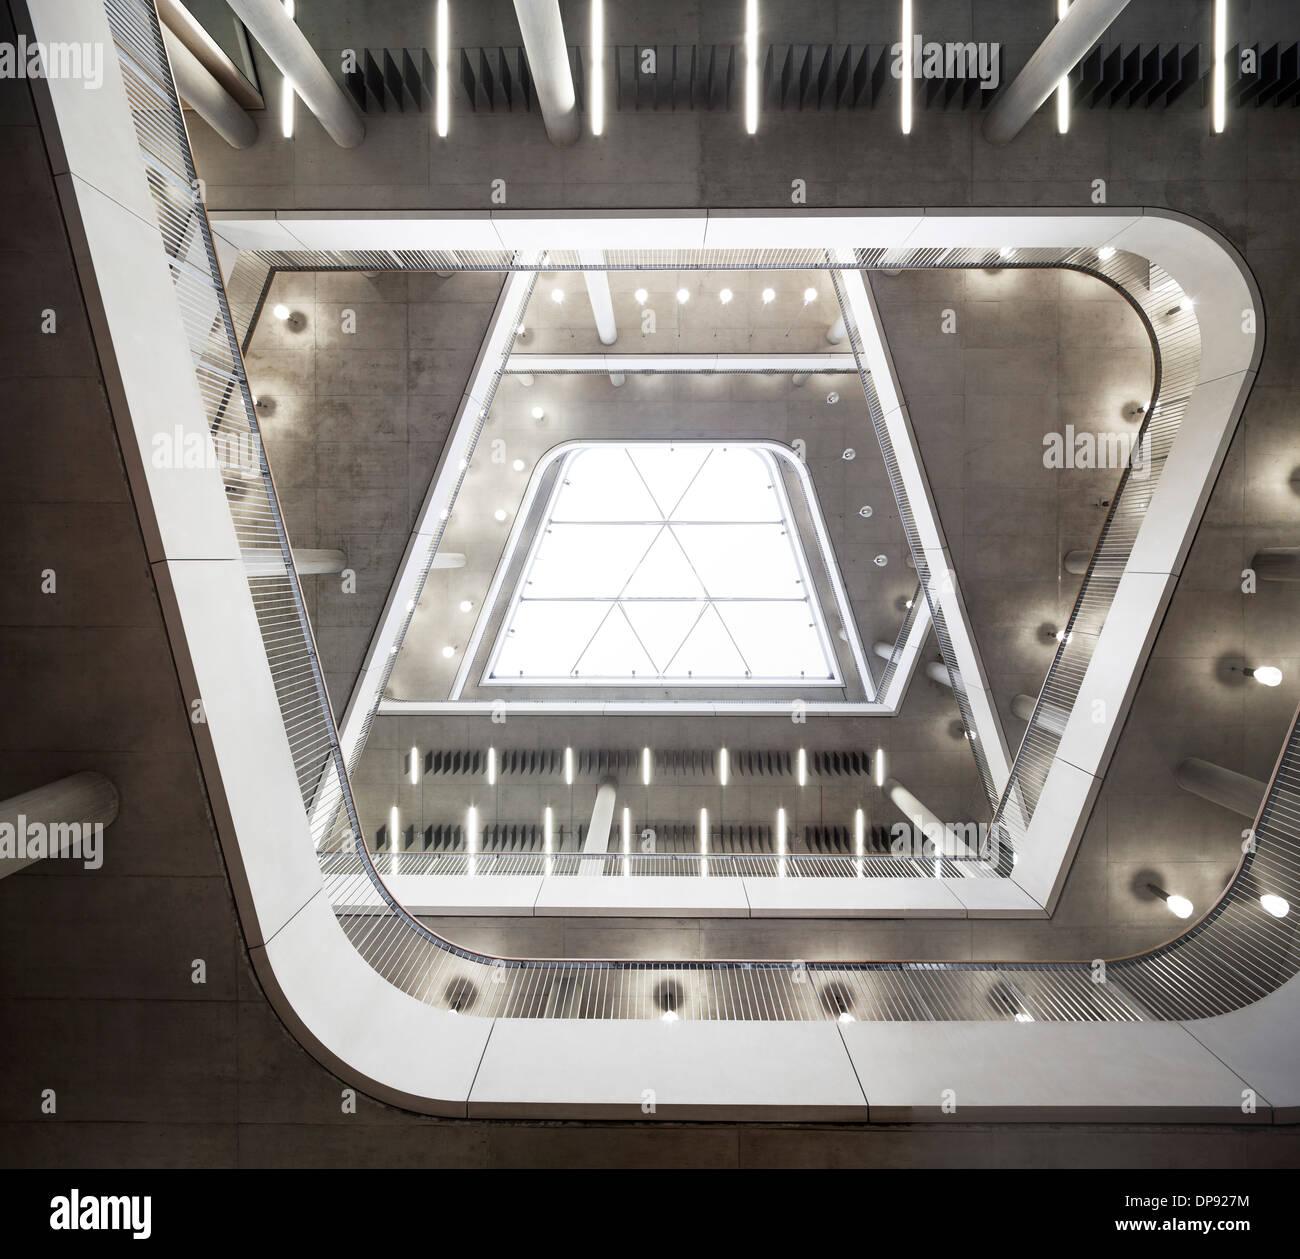 City of Westminster College, Atrium Interieur, London, UK. Stockbild